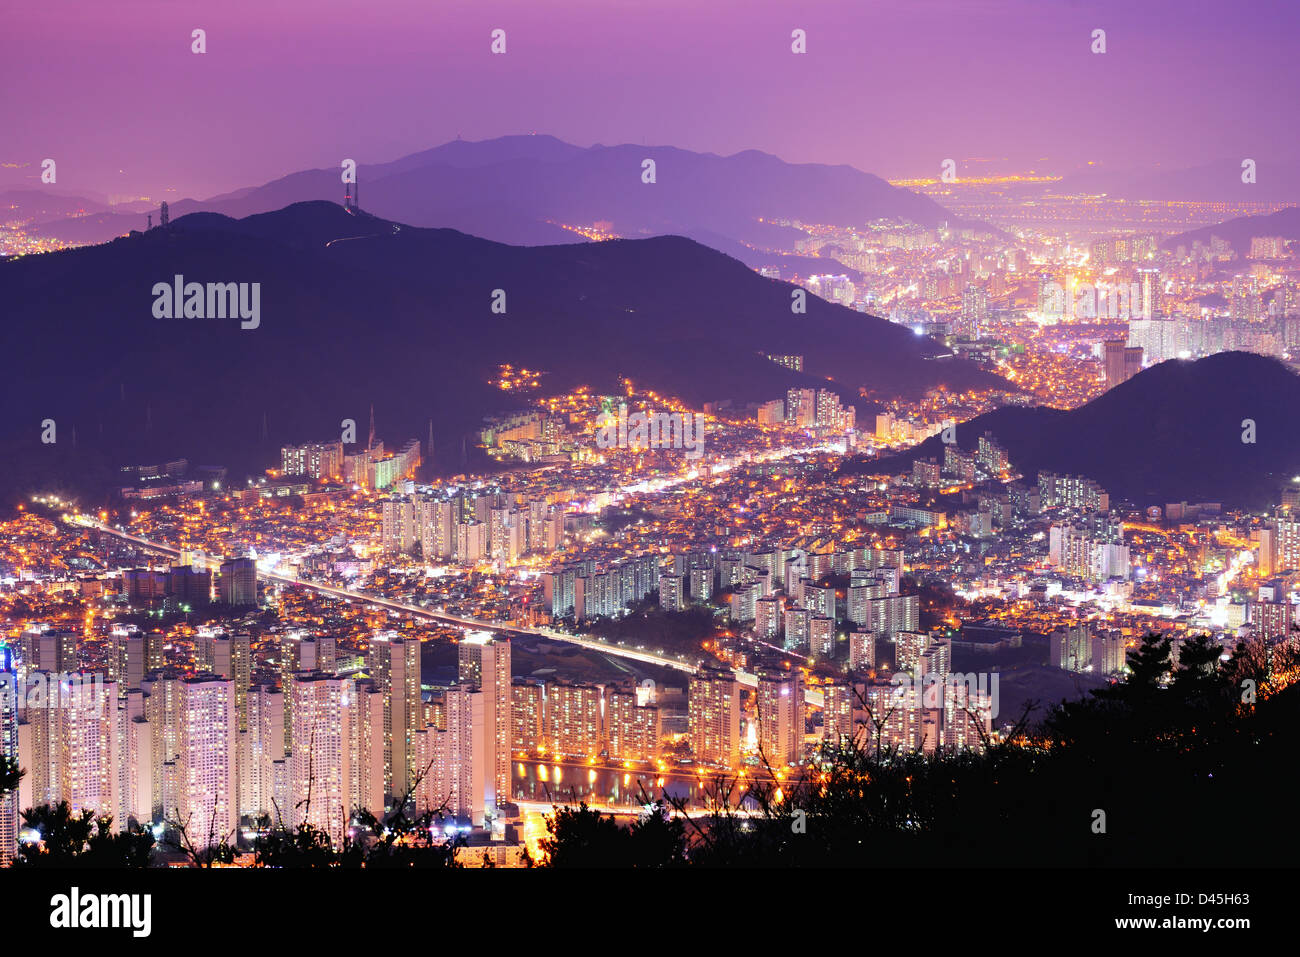 Skyline of Busan, South Korea at night. - Stock Image